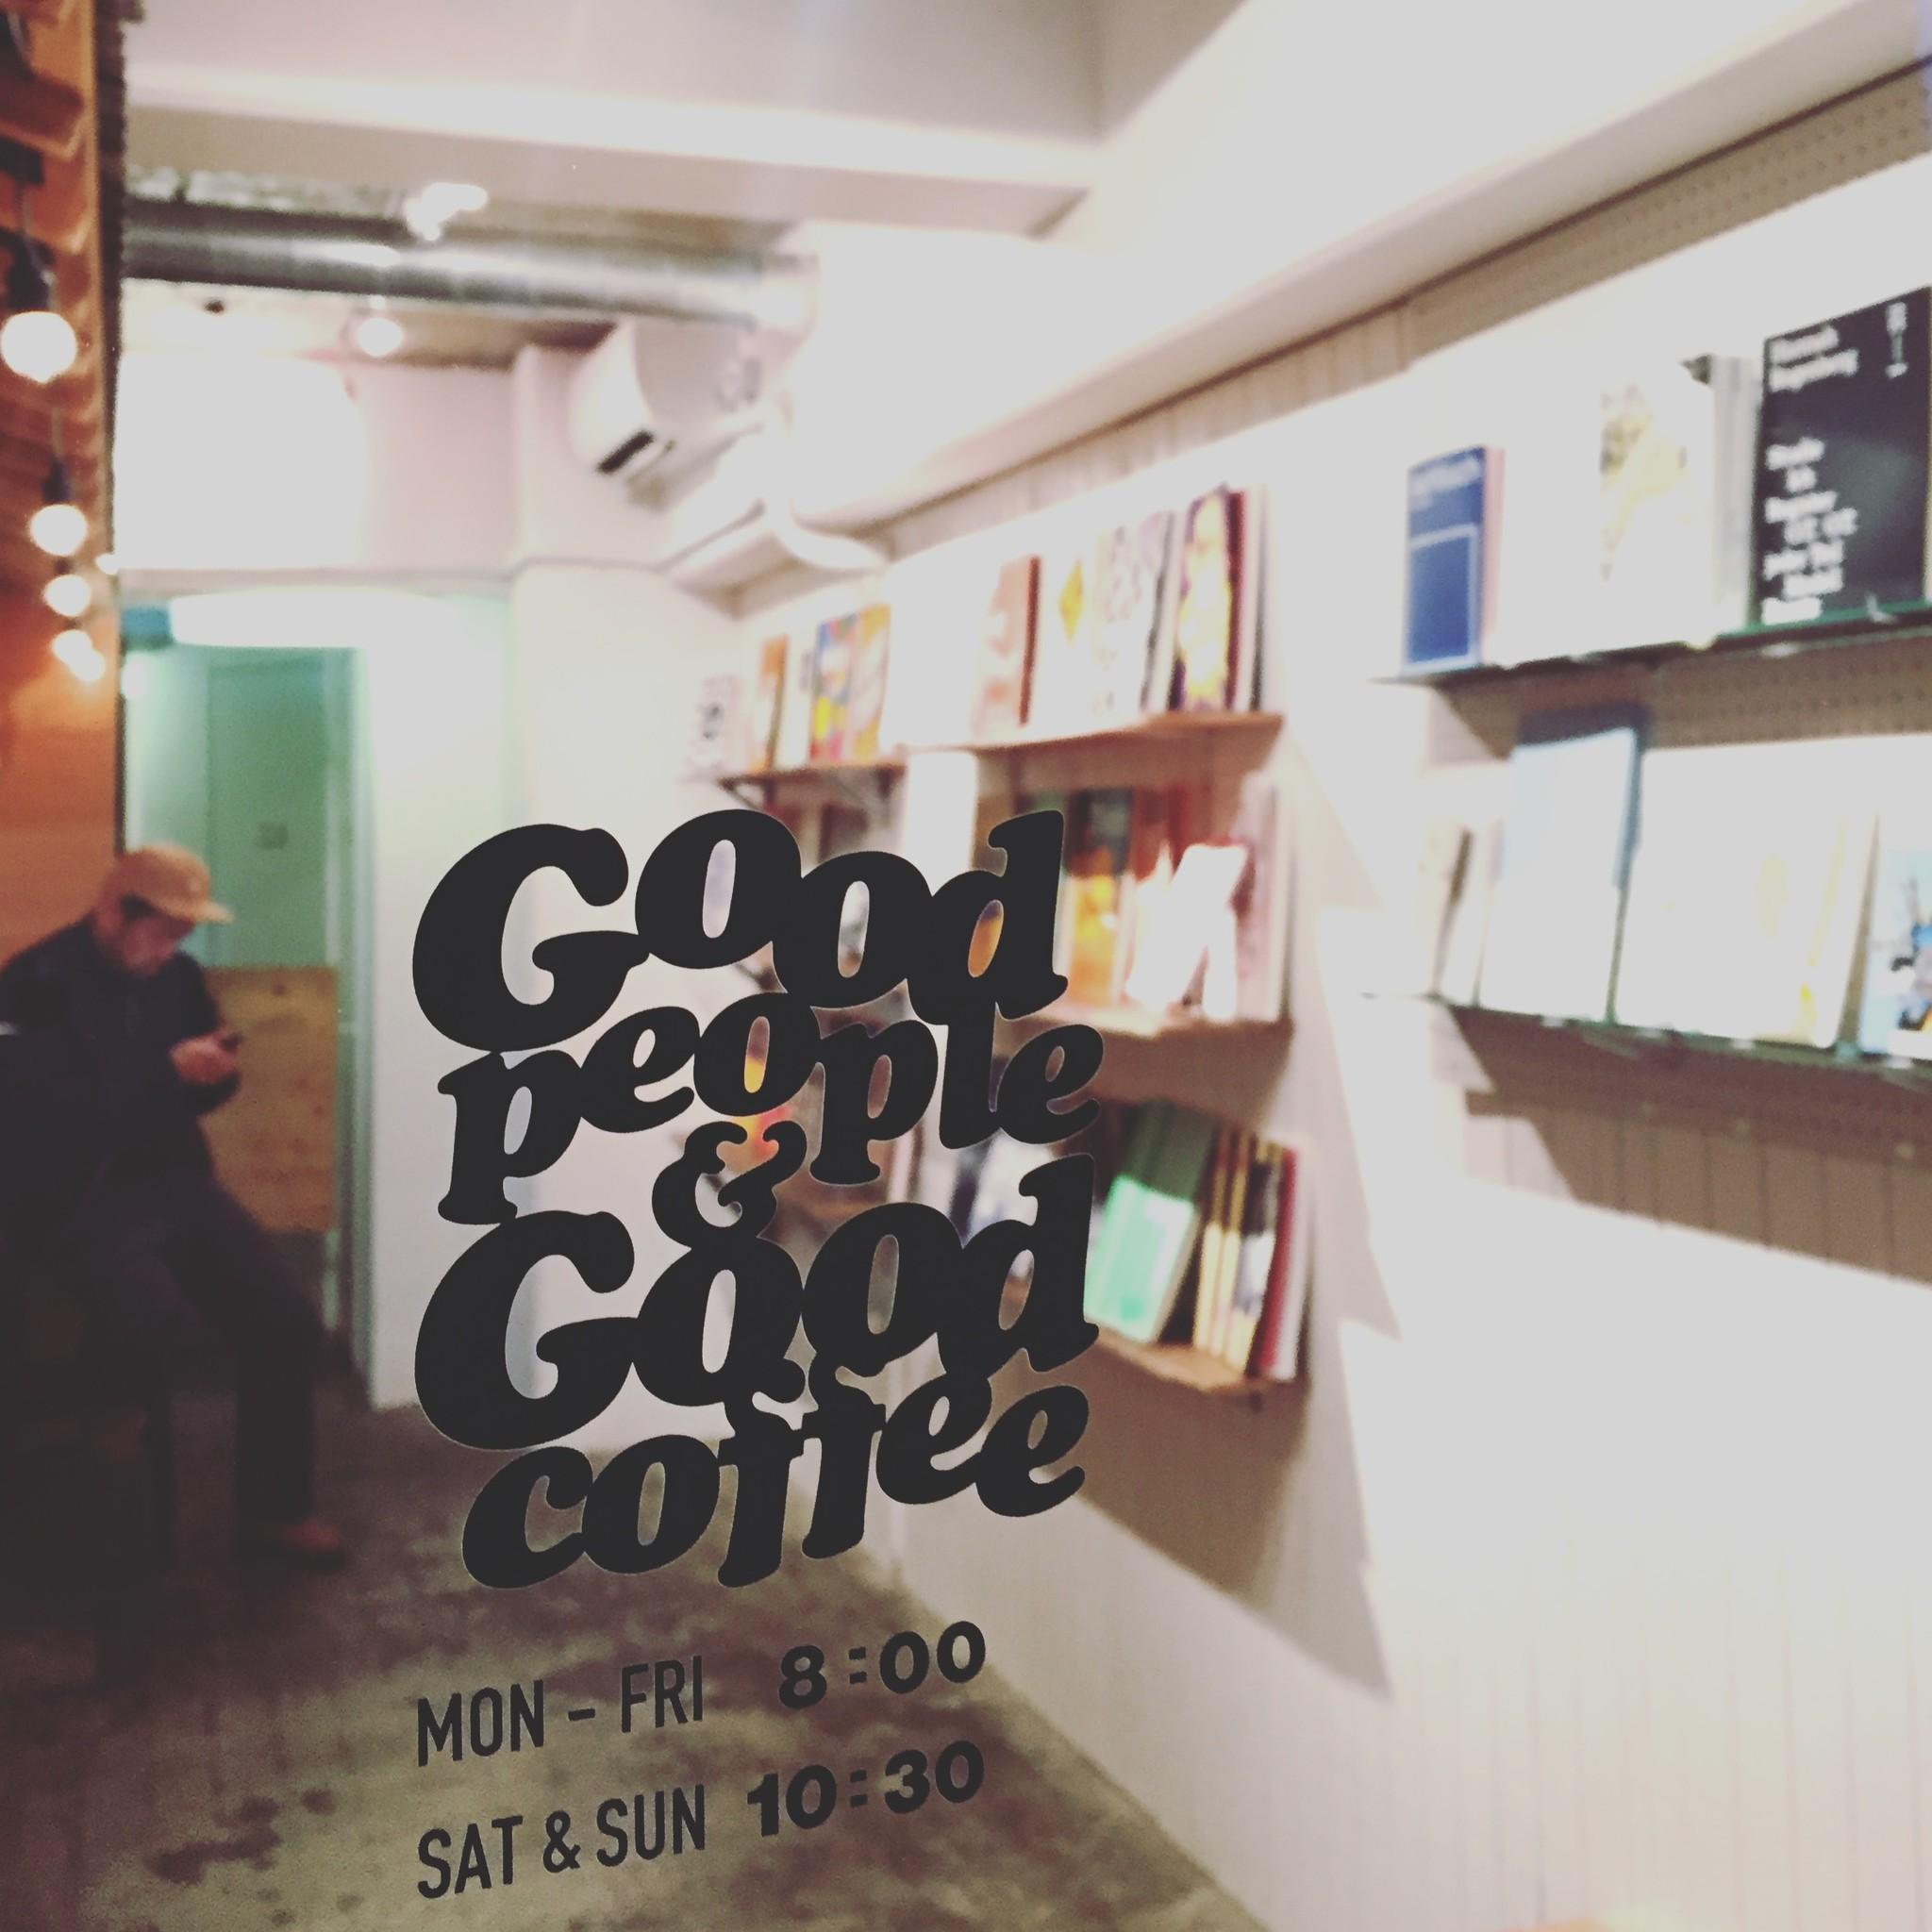 【1/27 START】Lubok Verlag at GPGC